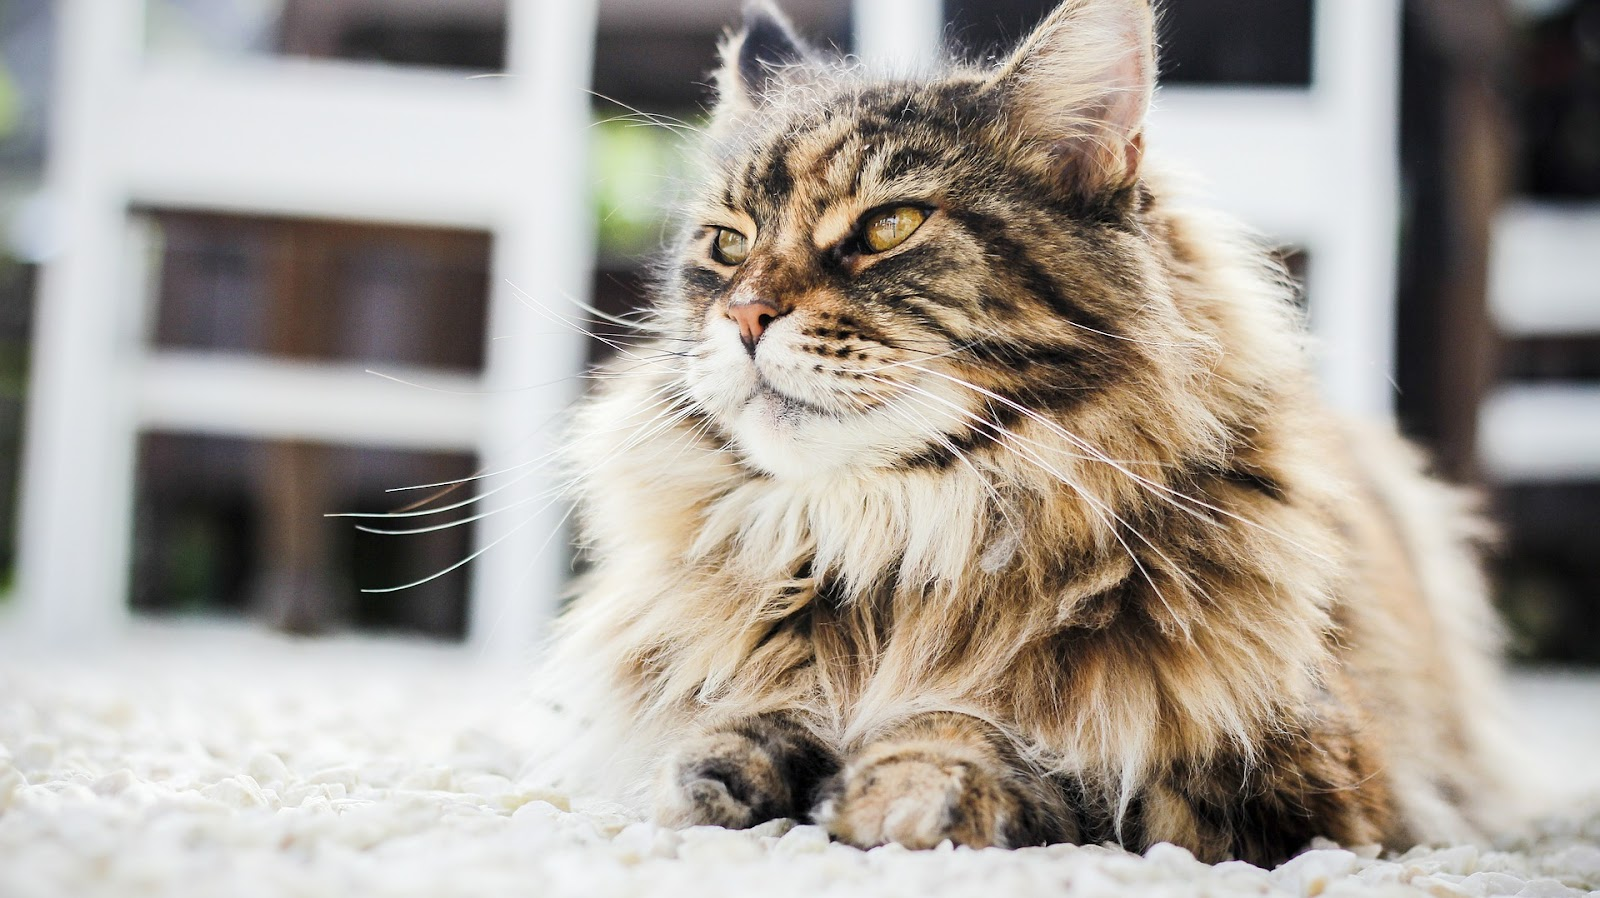 zadbana sierść kota